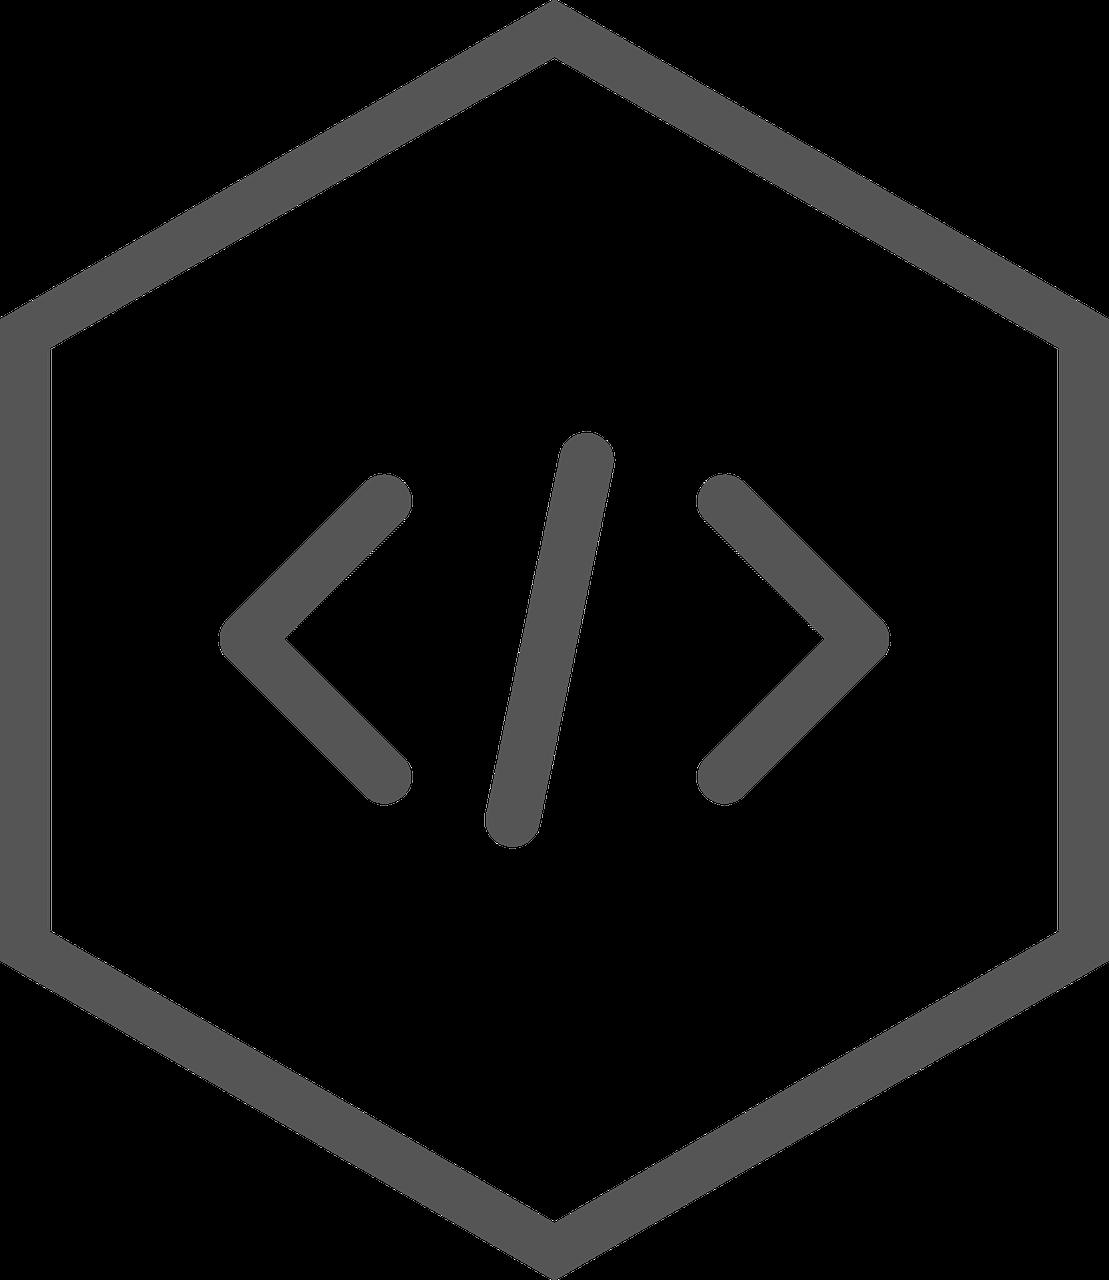 hexagone codage